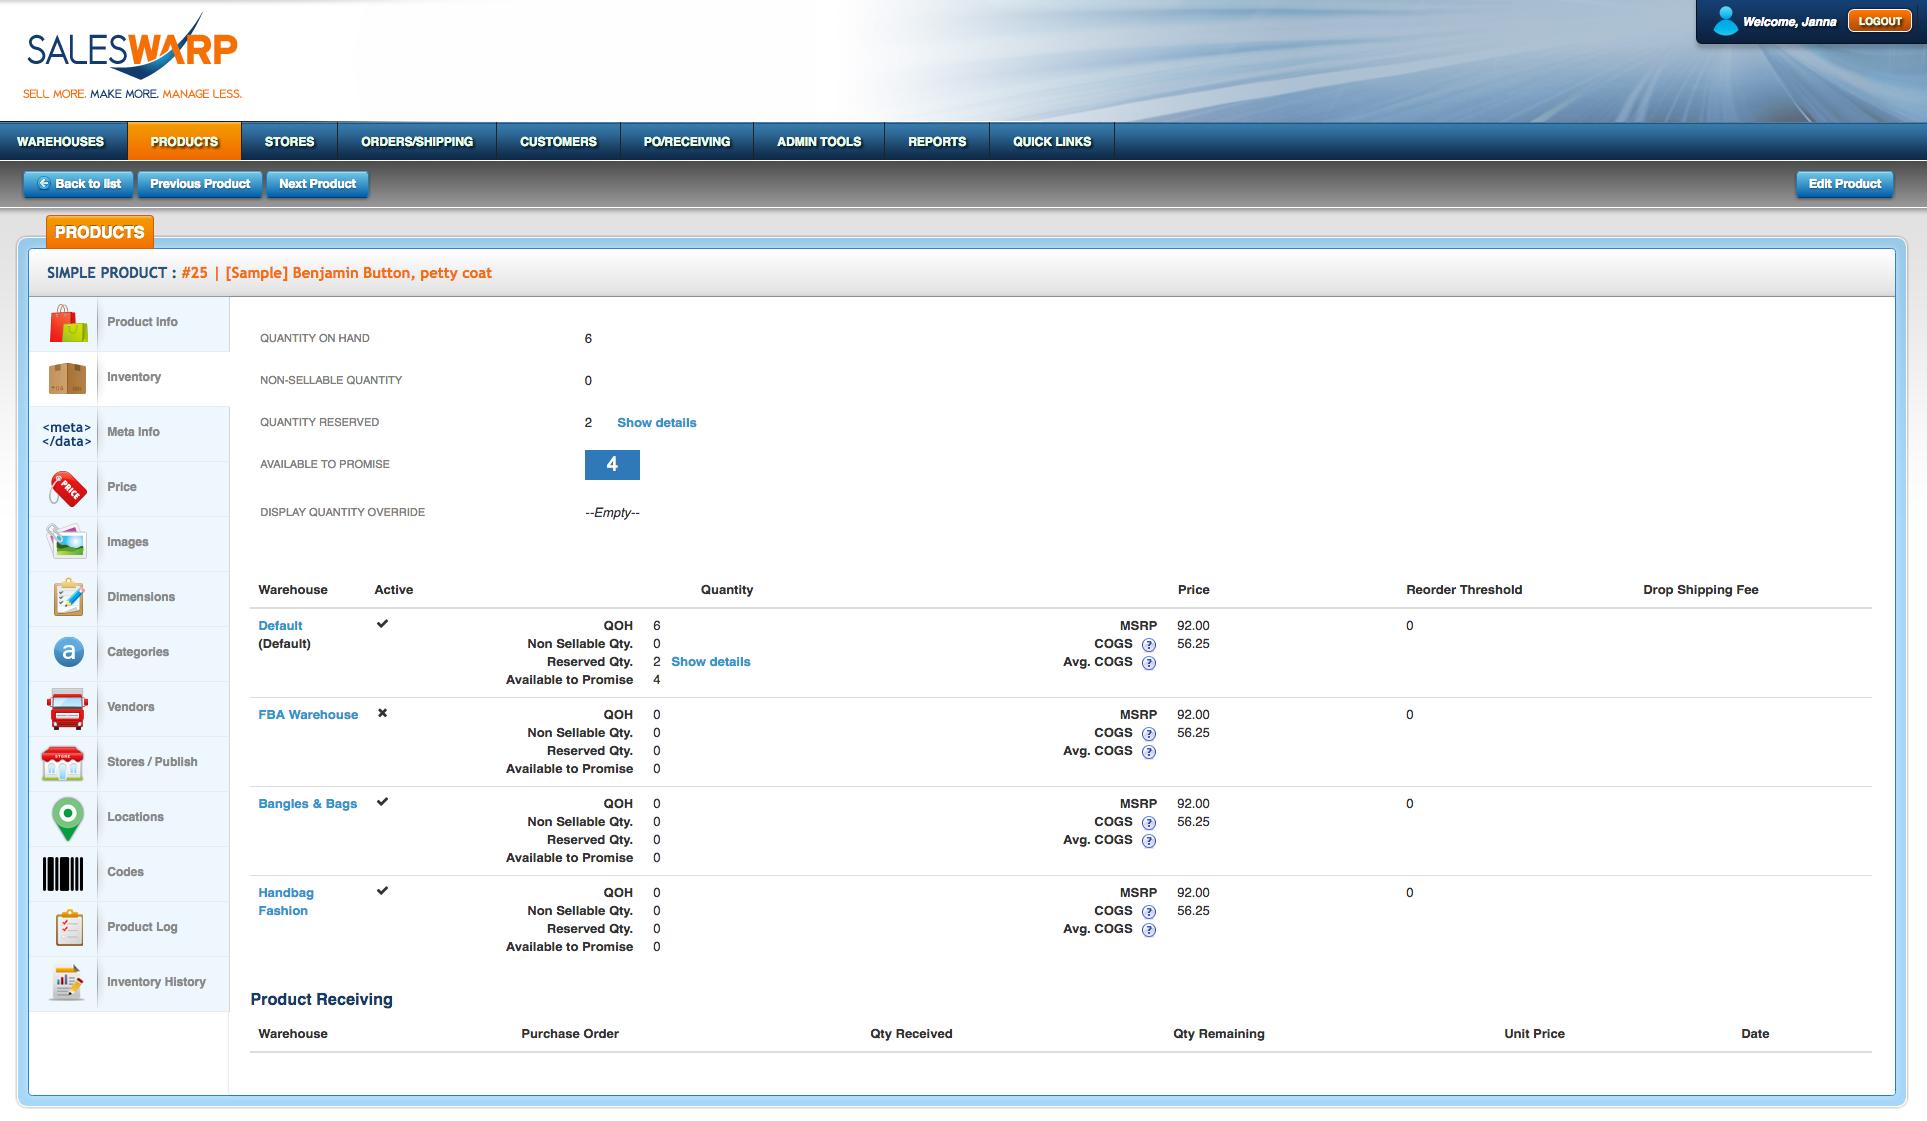 SalesWarp screenshot: SalesWarp - Inventory